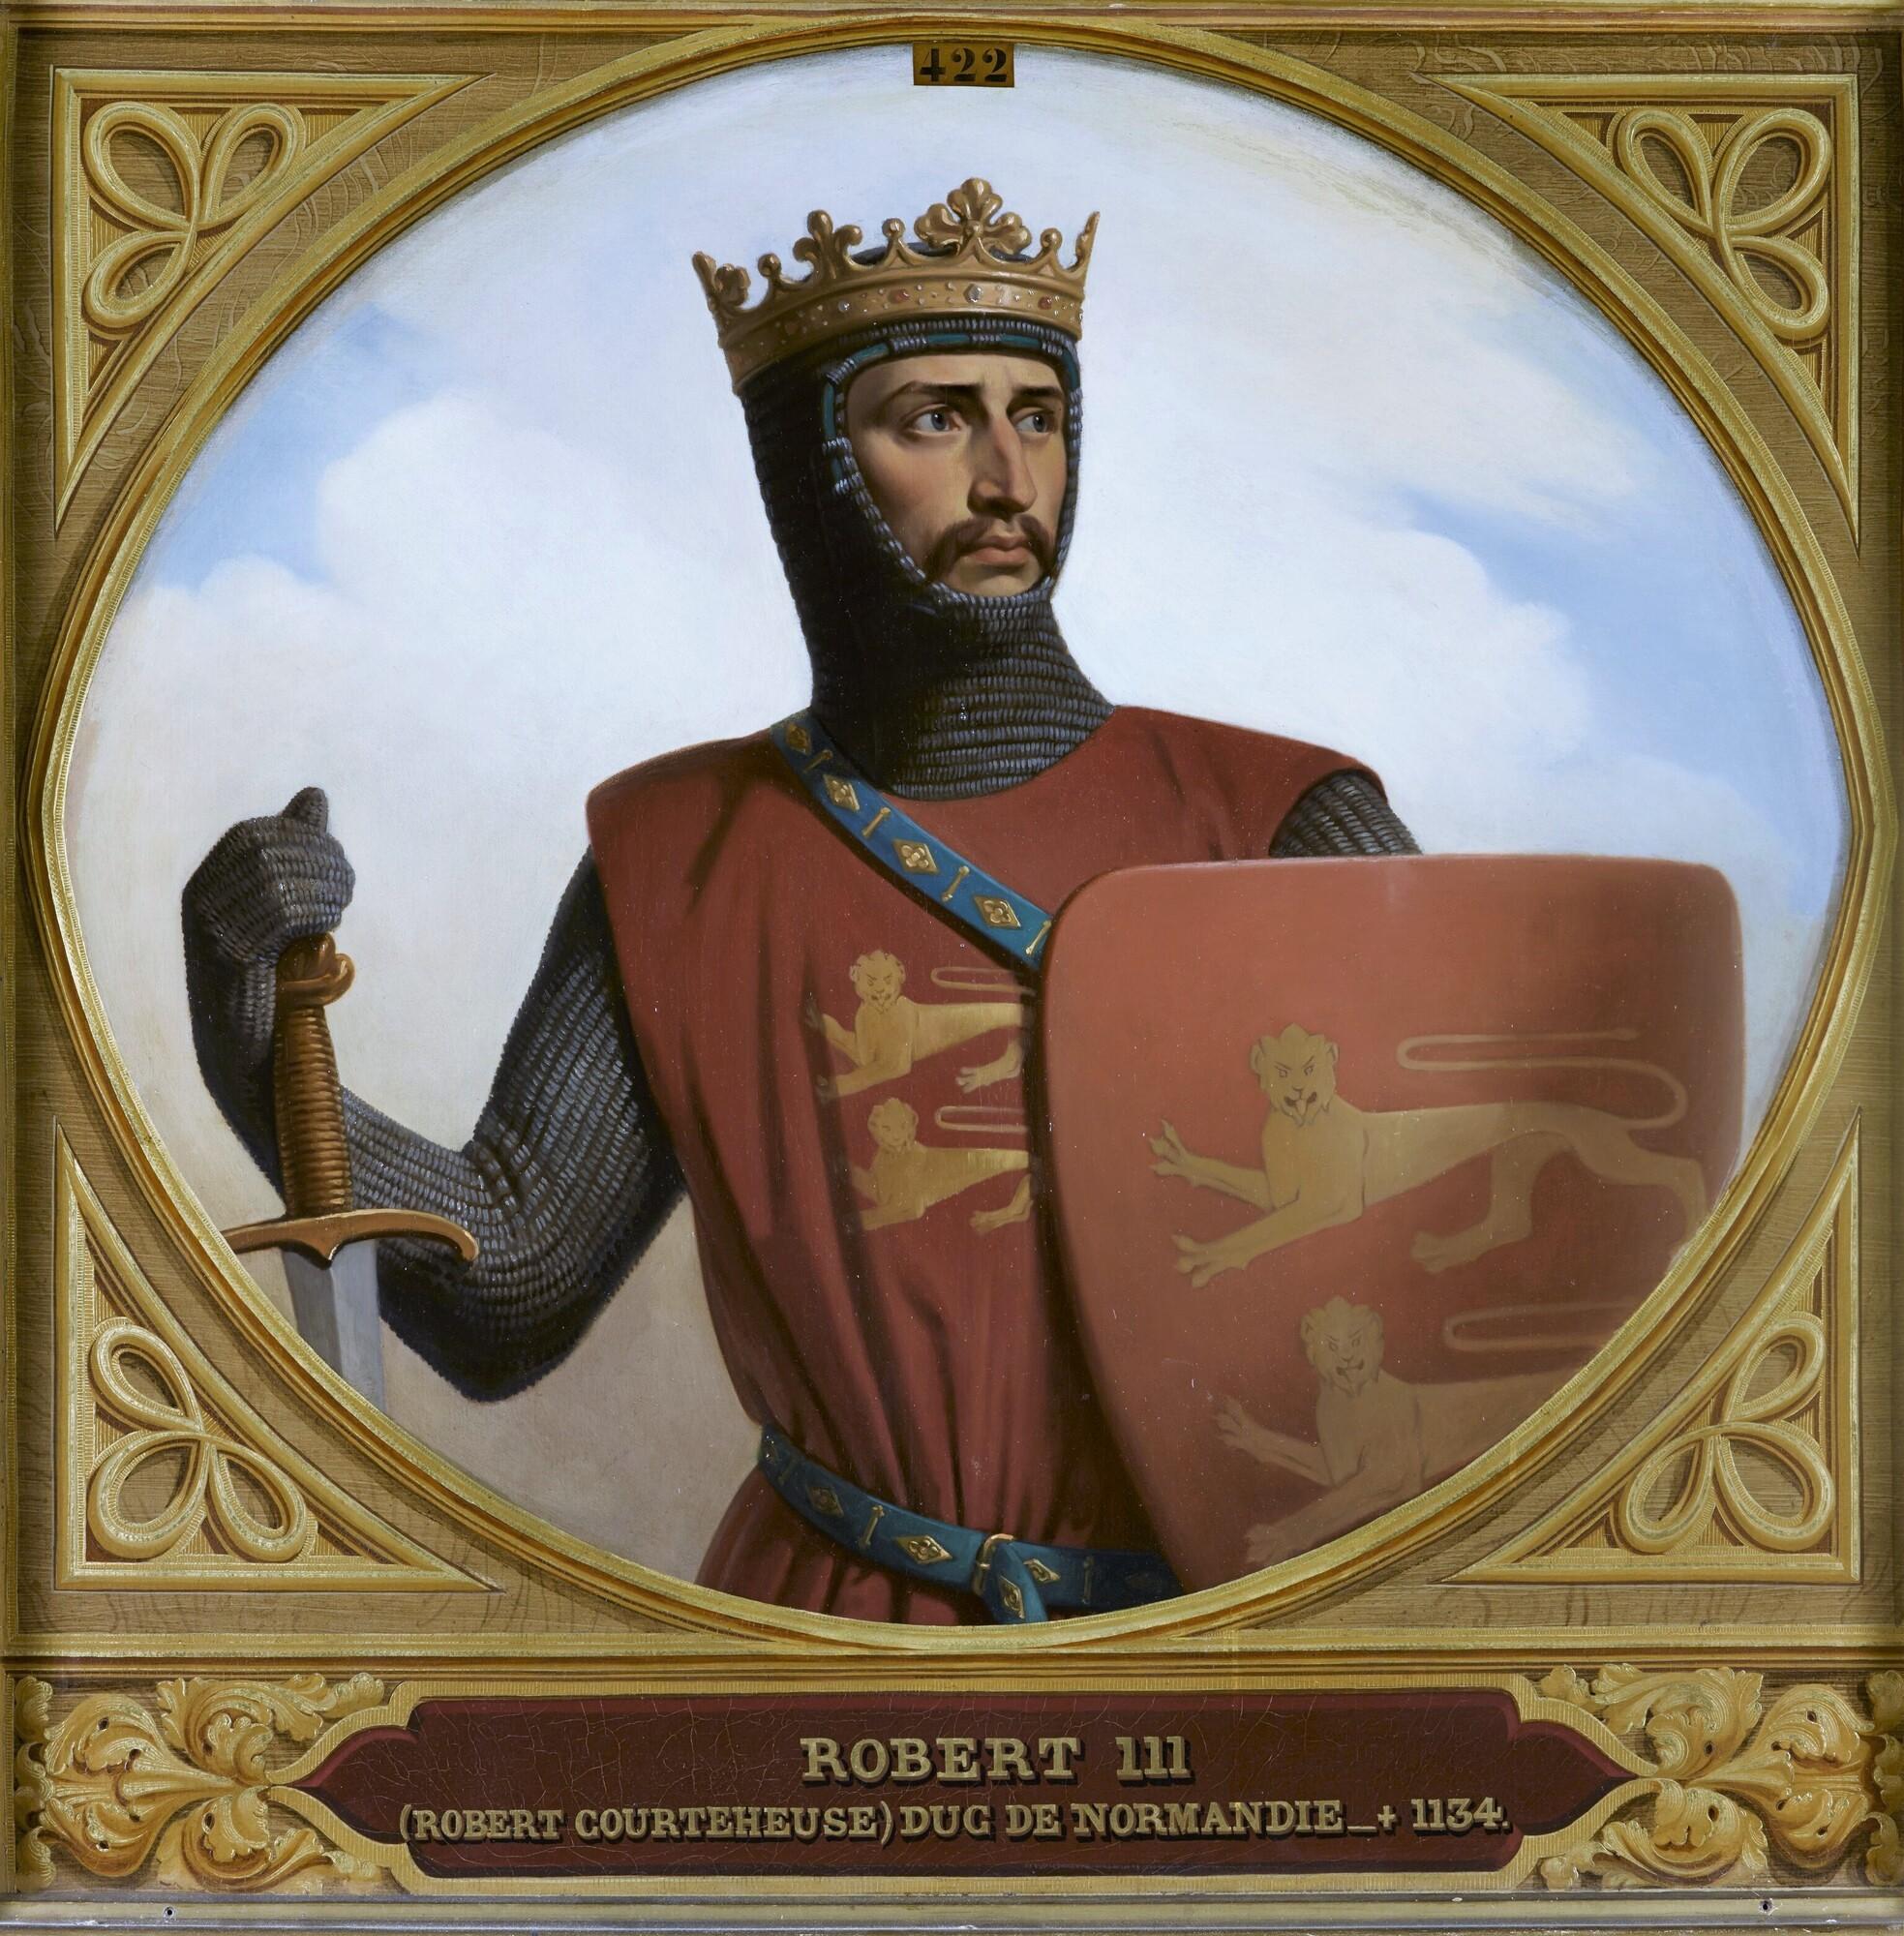 Robert III, dit Courteheuse, duc de Normandie (1058-1134). Peintre : Henri Decaisne.